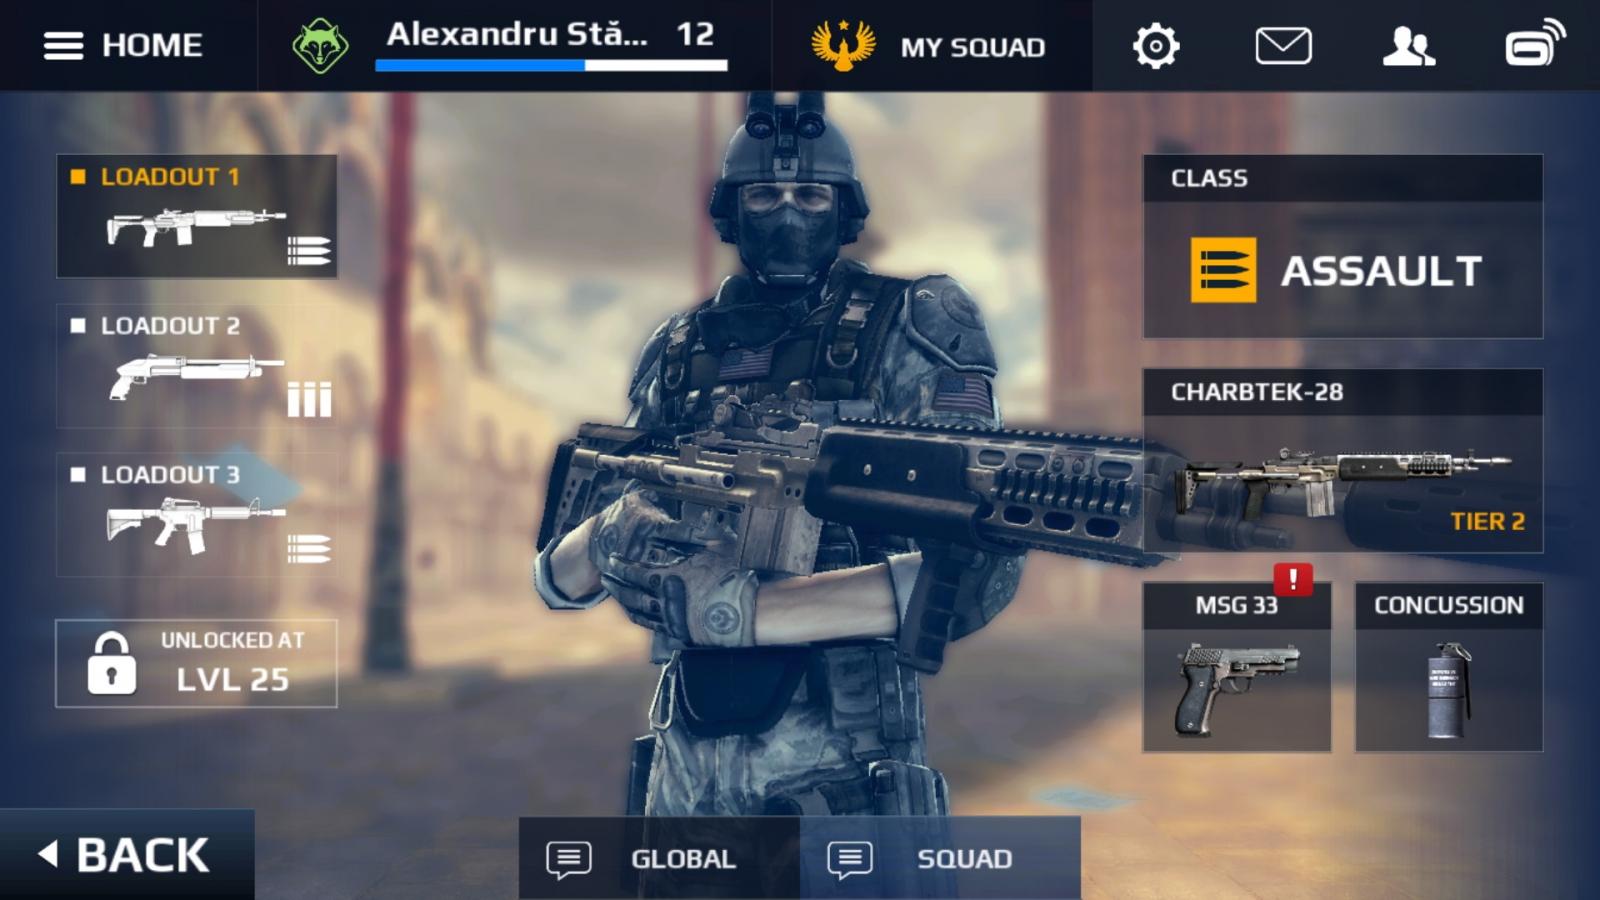 Modern combat 5 blackout review oneplus one un fps for Combat portent 2014 review